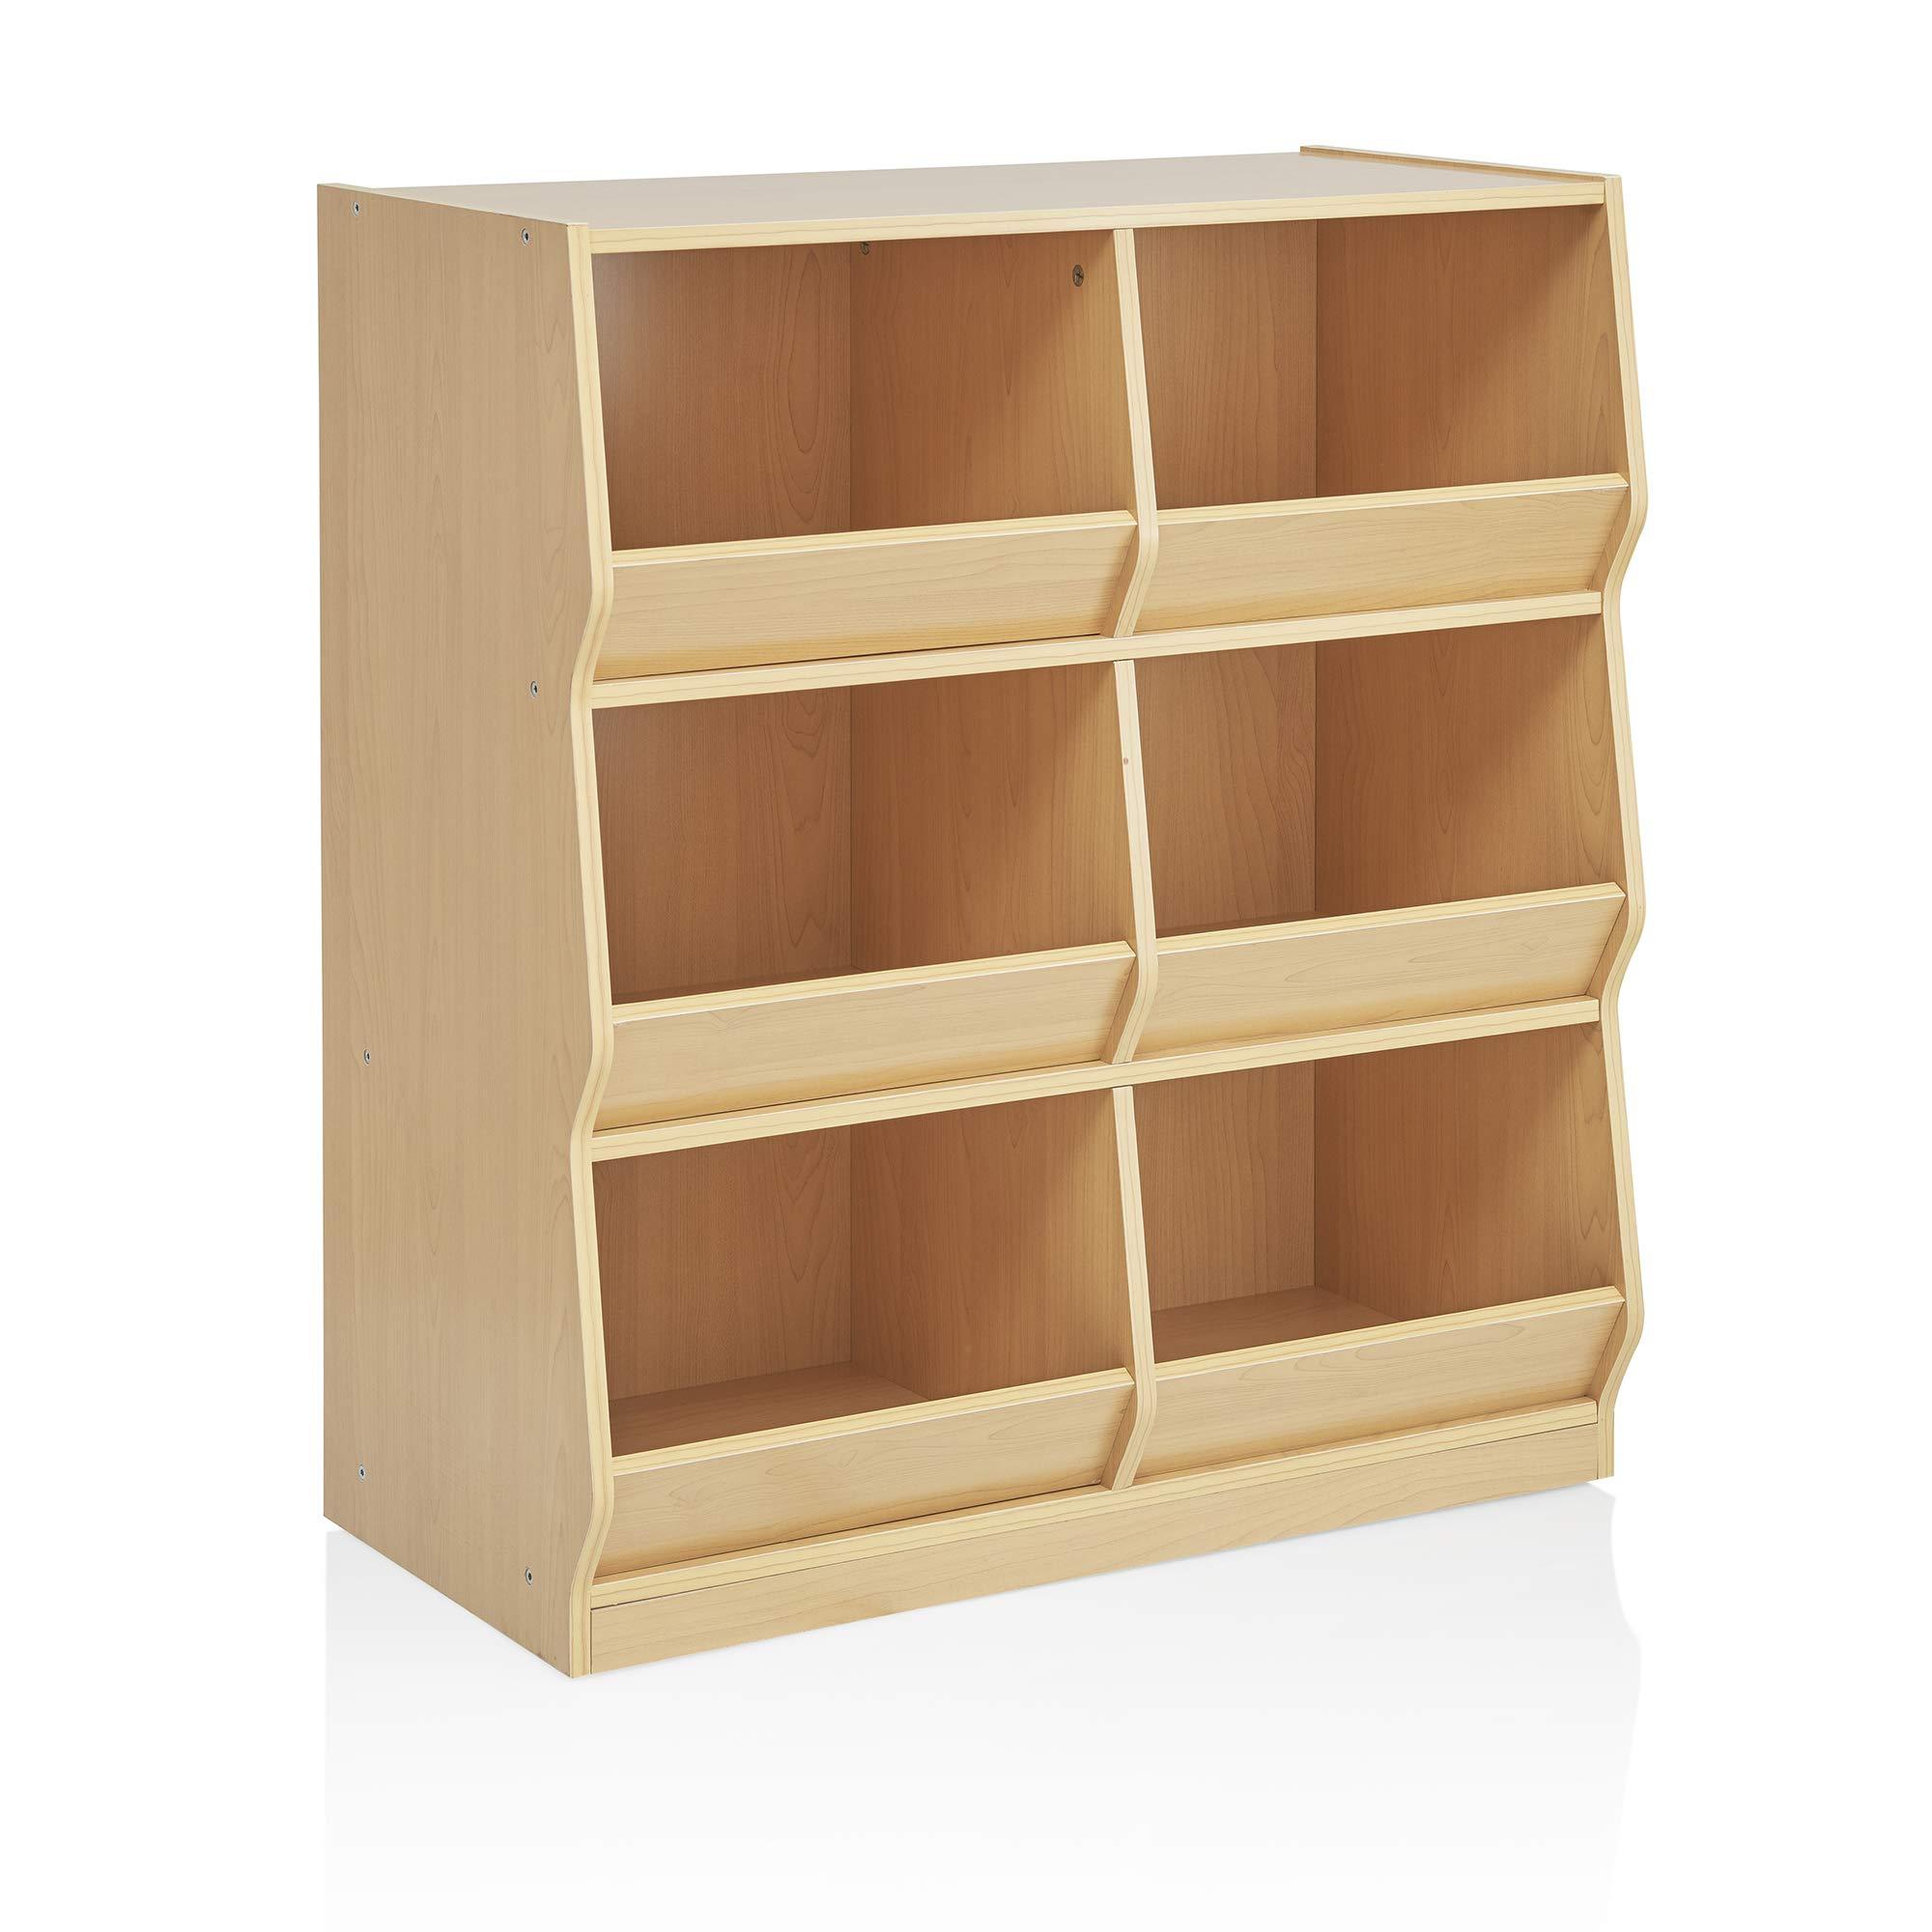 Guidecraft Children's Toy Bin Cubby Organizer - Wooden Storage Shelving Furniture for Classroom Playroom by Guidecraft